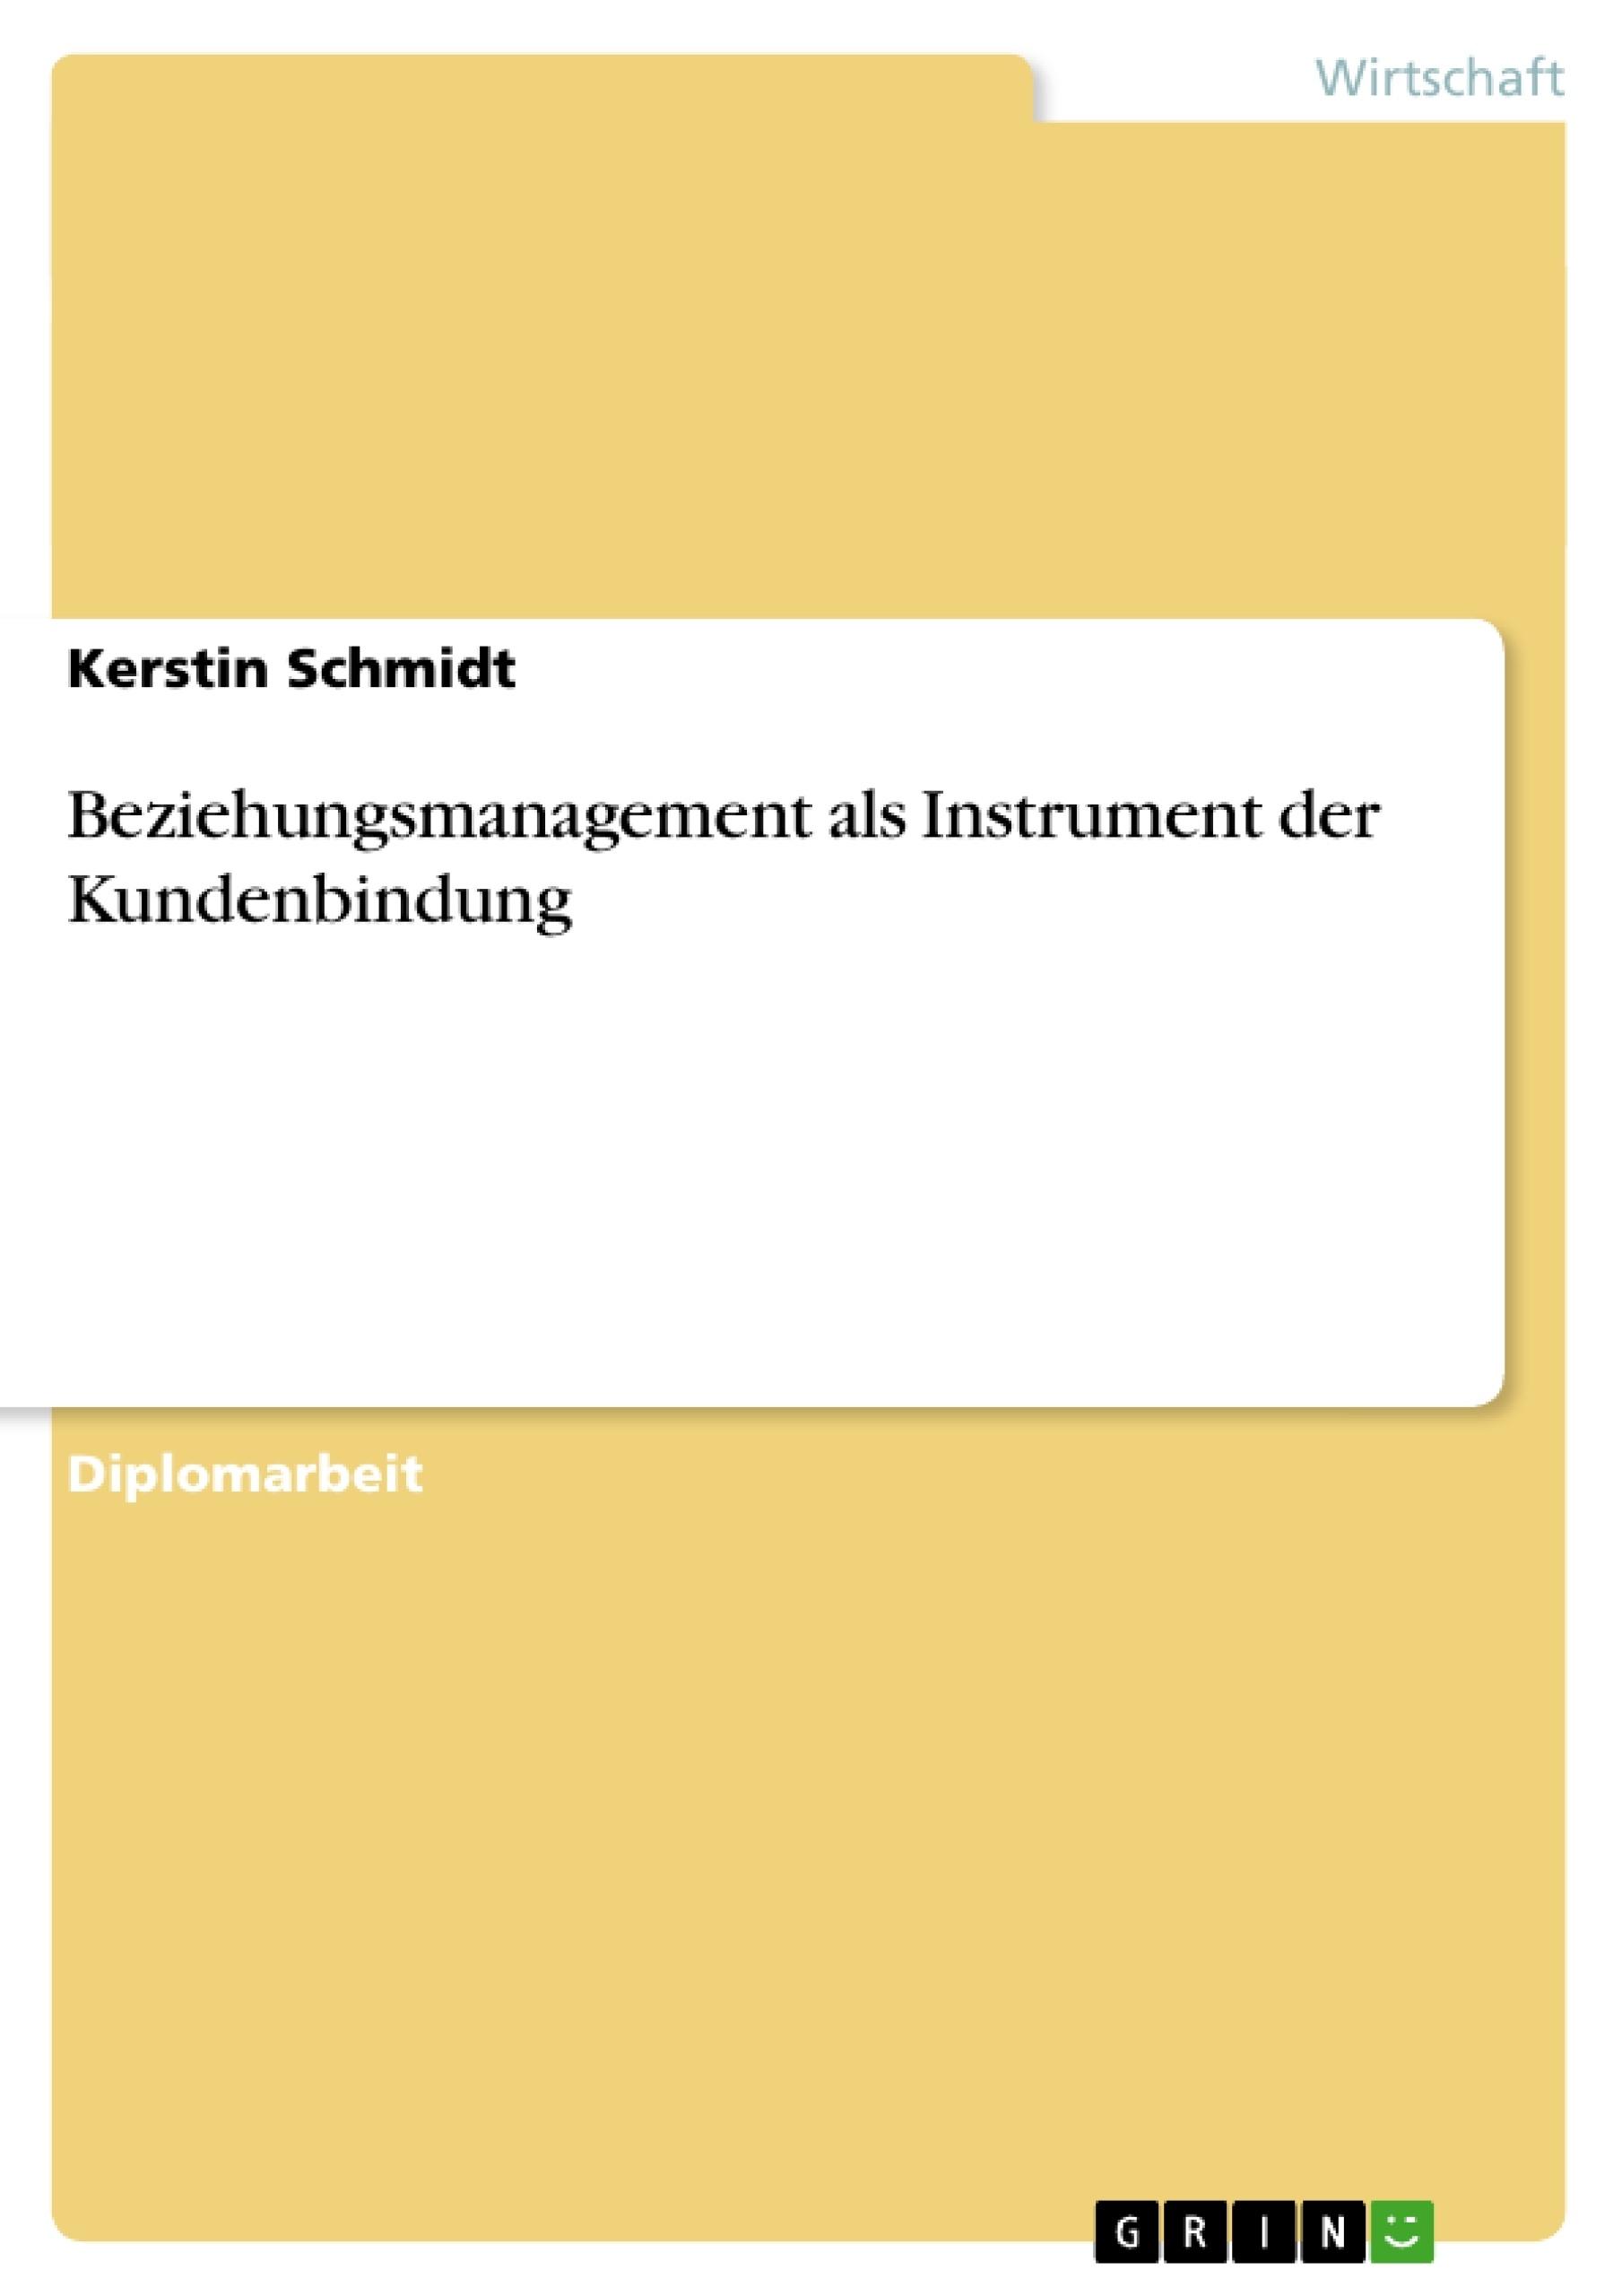 Titel: Beziehungsmanagement als Instrument der Kundenbindung